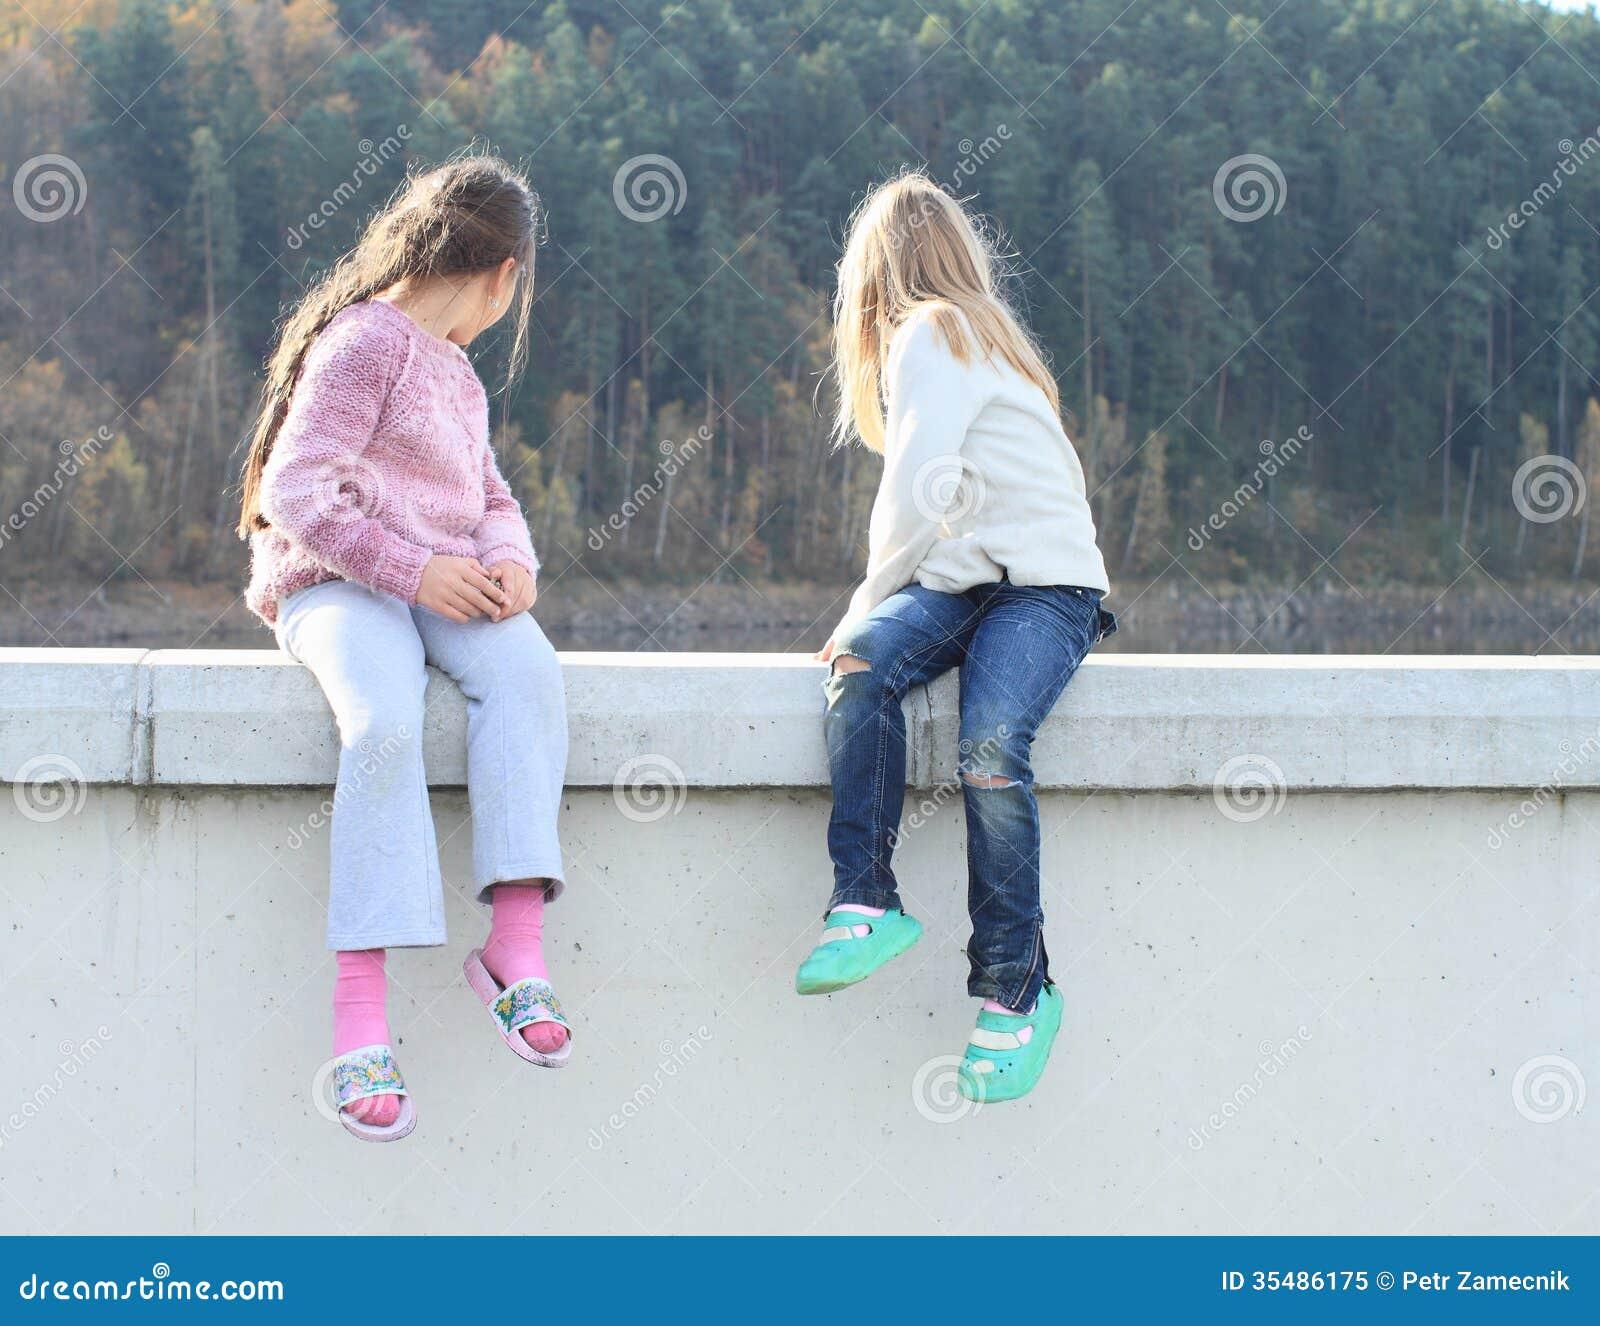 girls looking behind wall royalty free stock photo